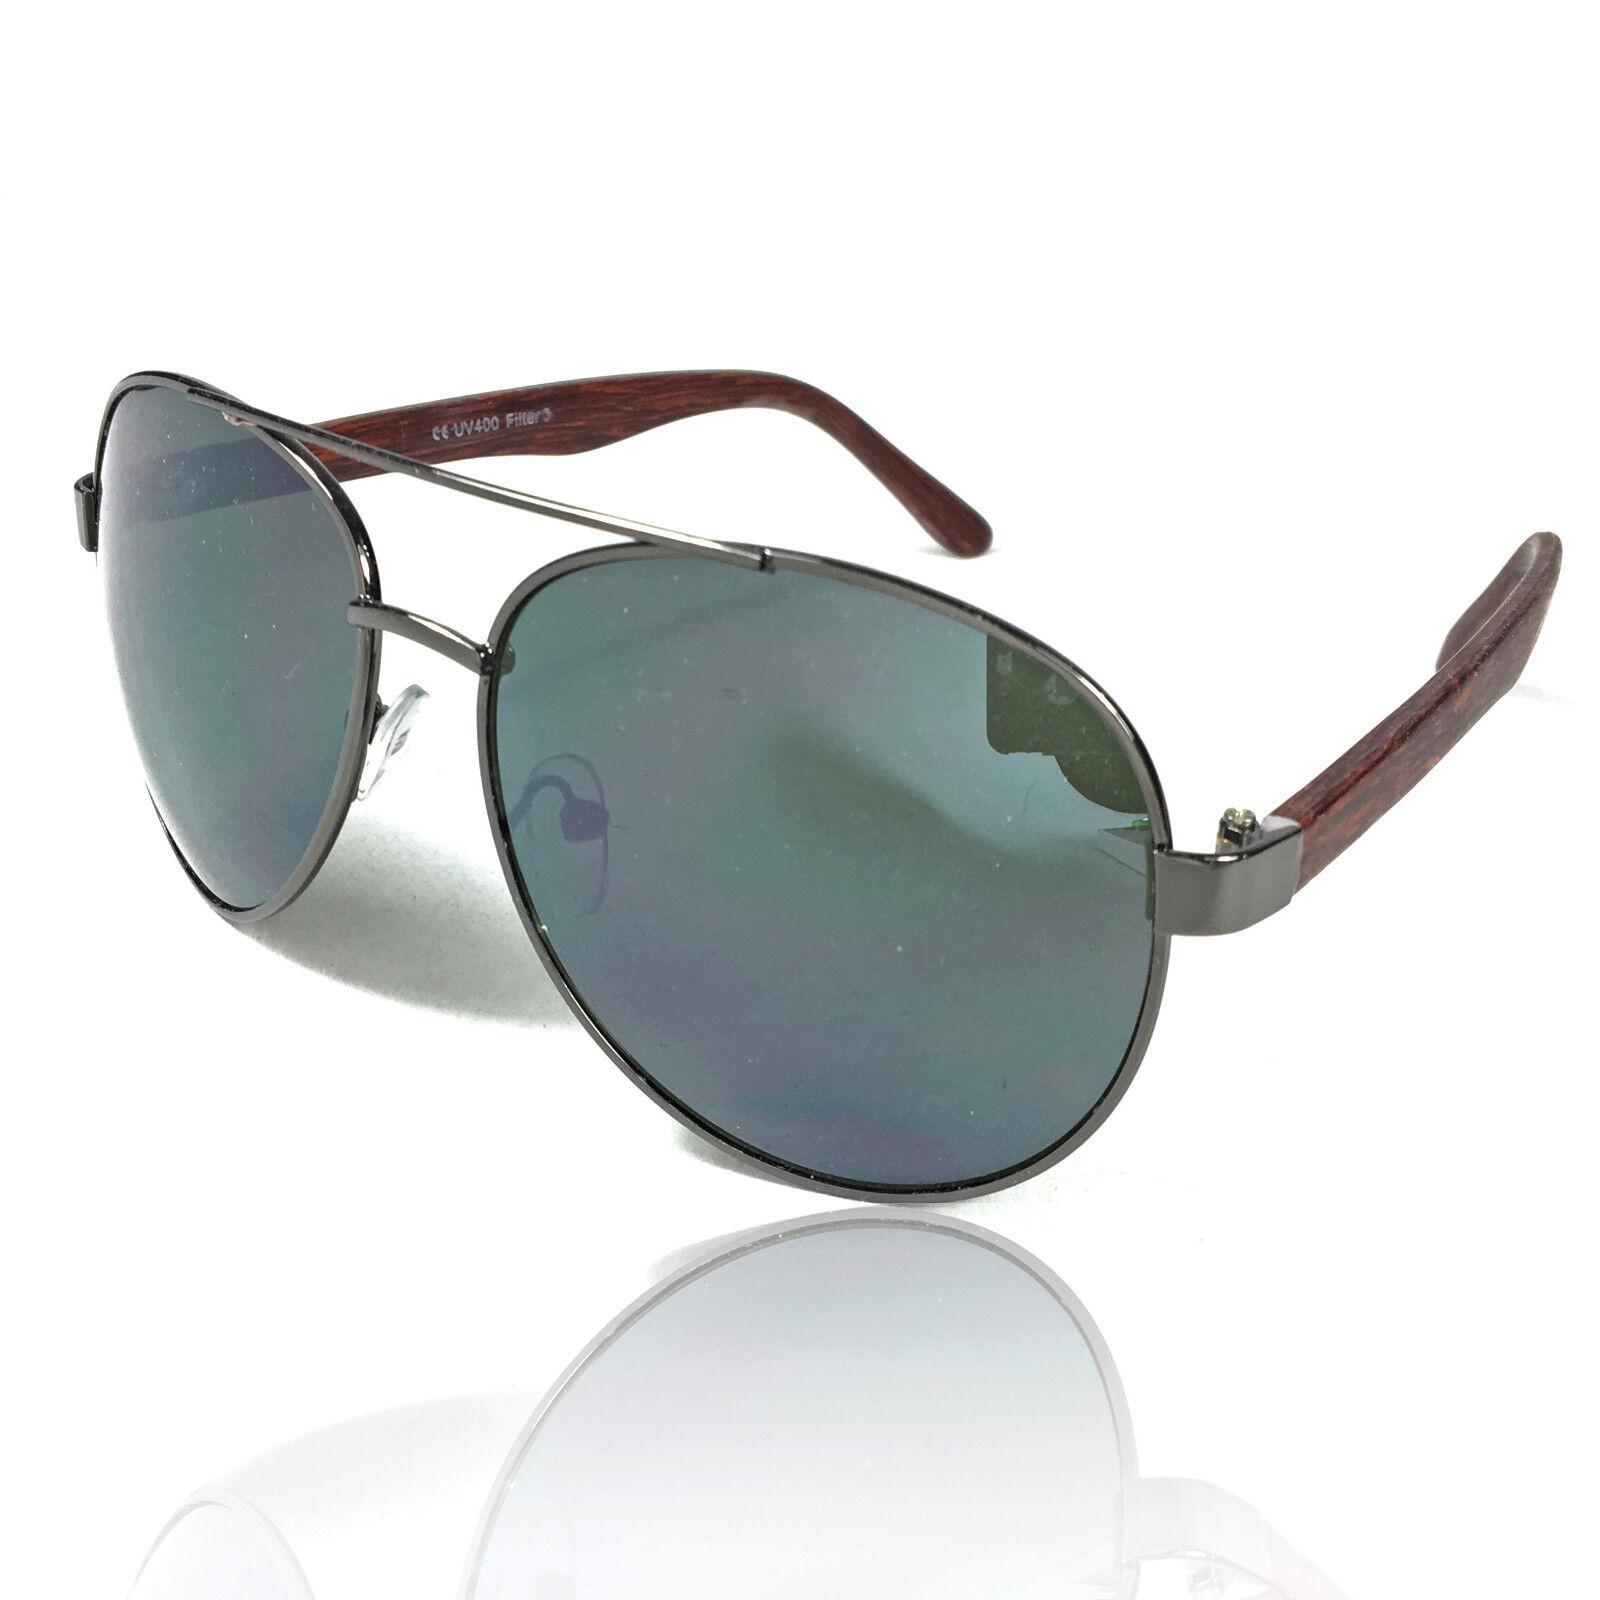 Coole Piloten Sonnenbrille Retro Style Bügel in Holzoptik